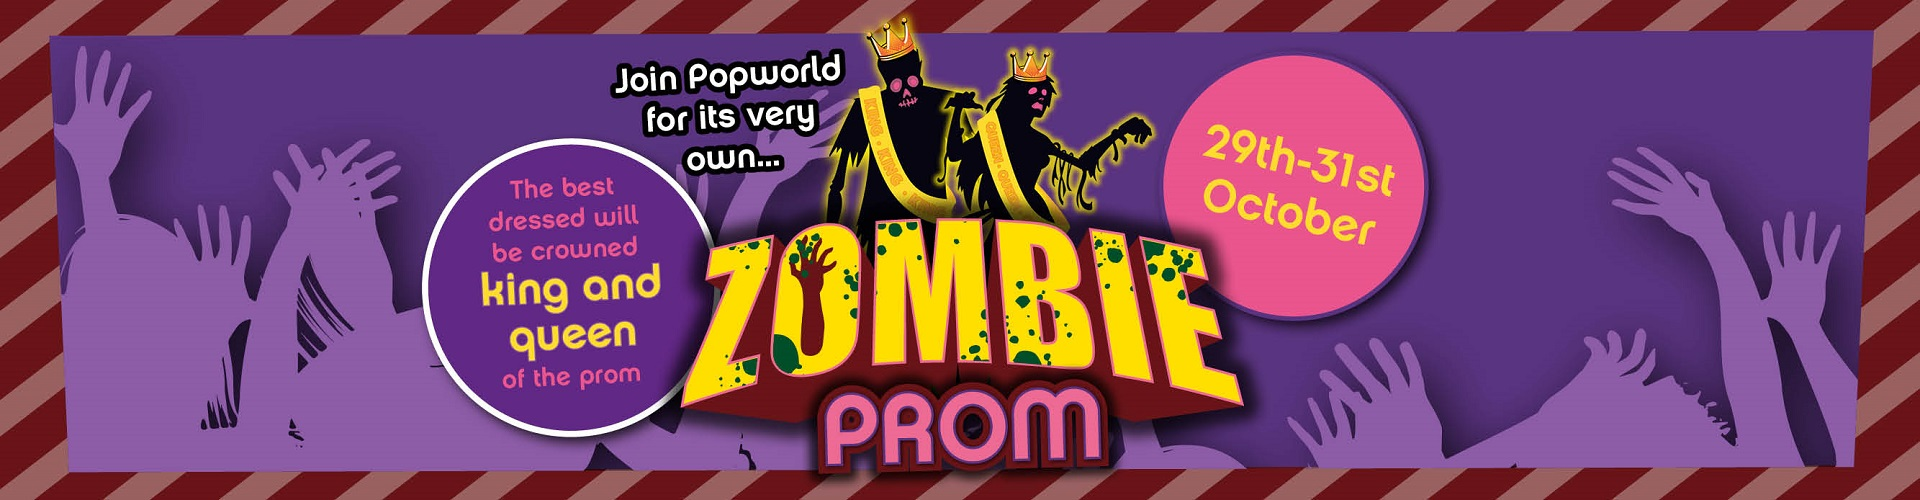 Halloween Zombie Prom at Popworld